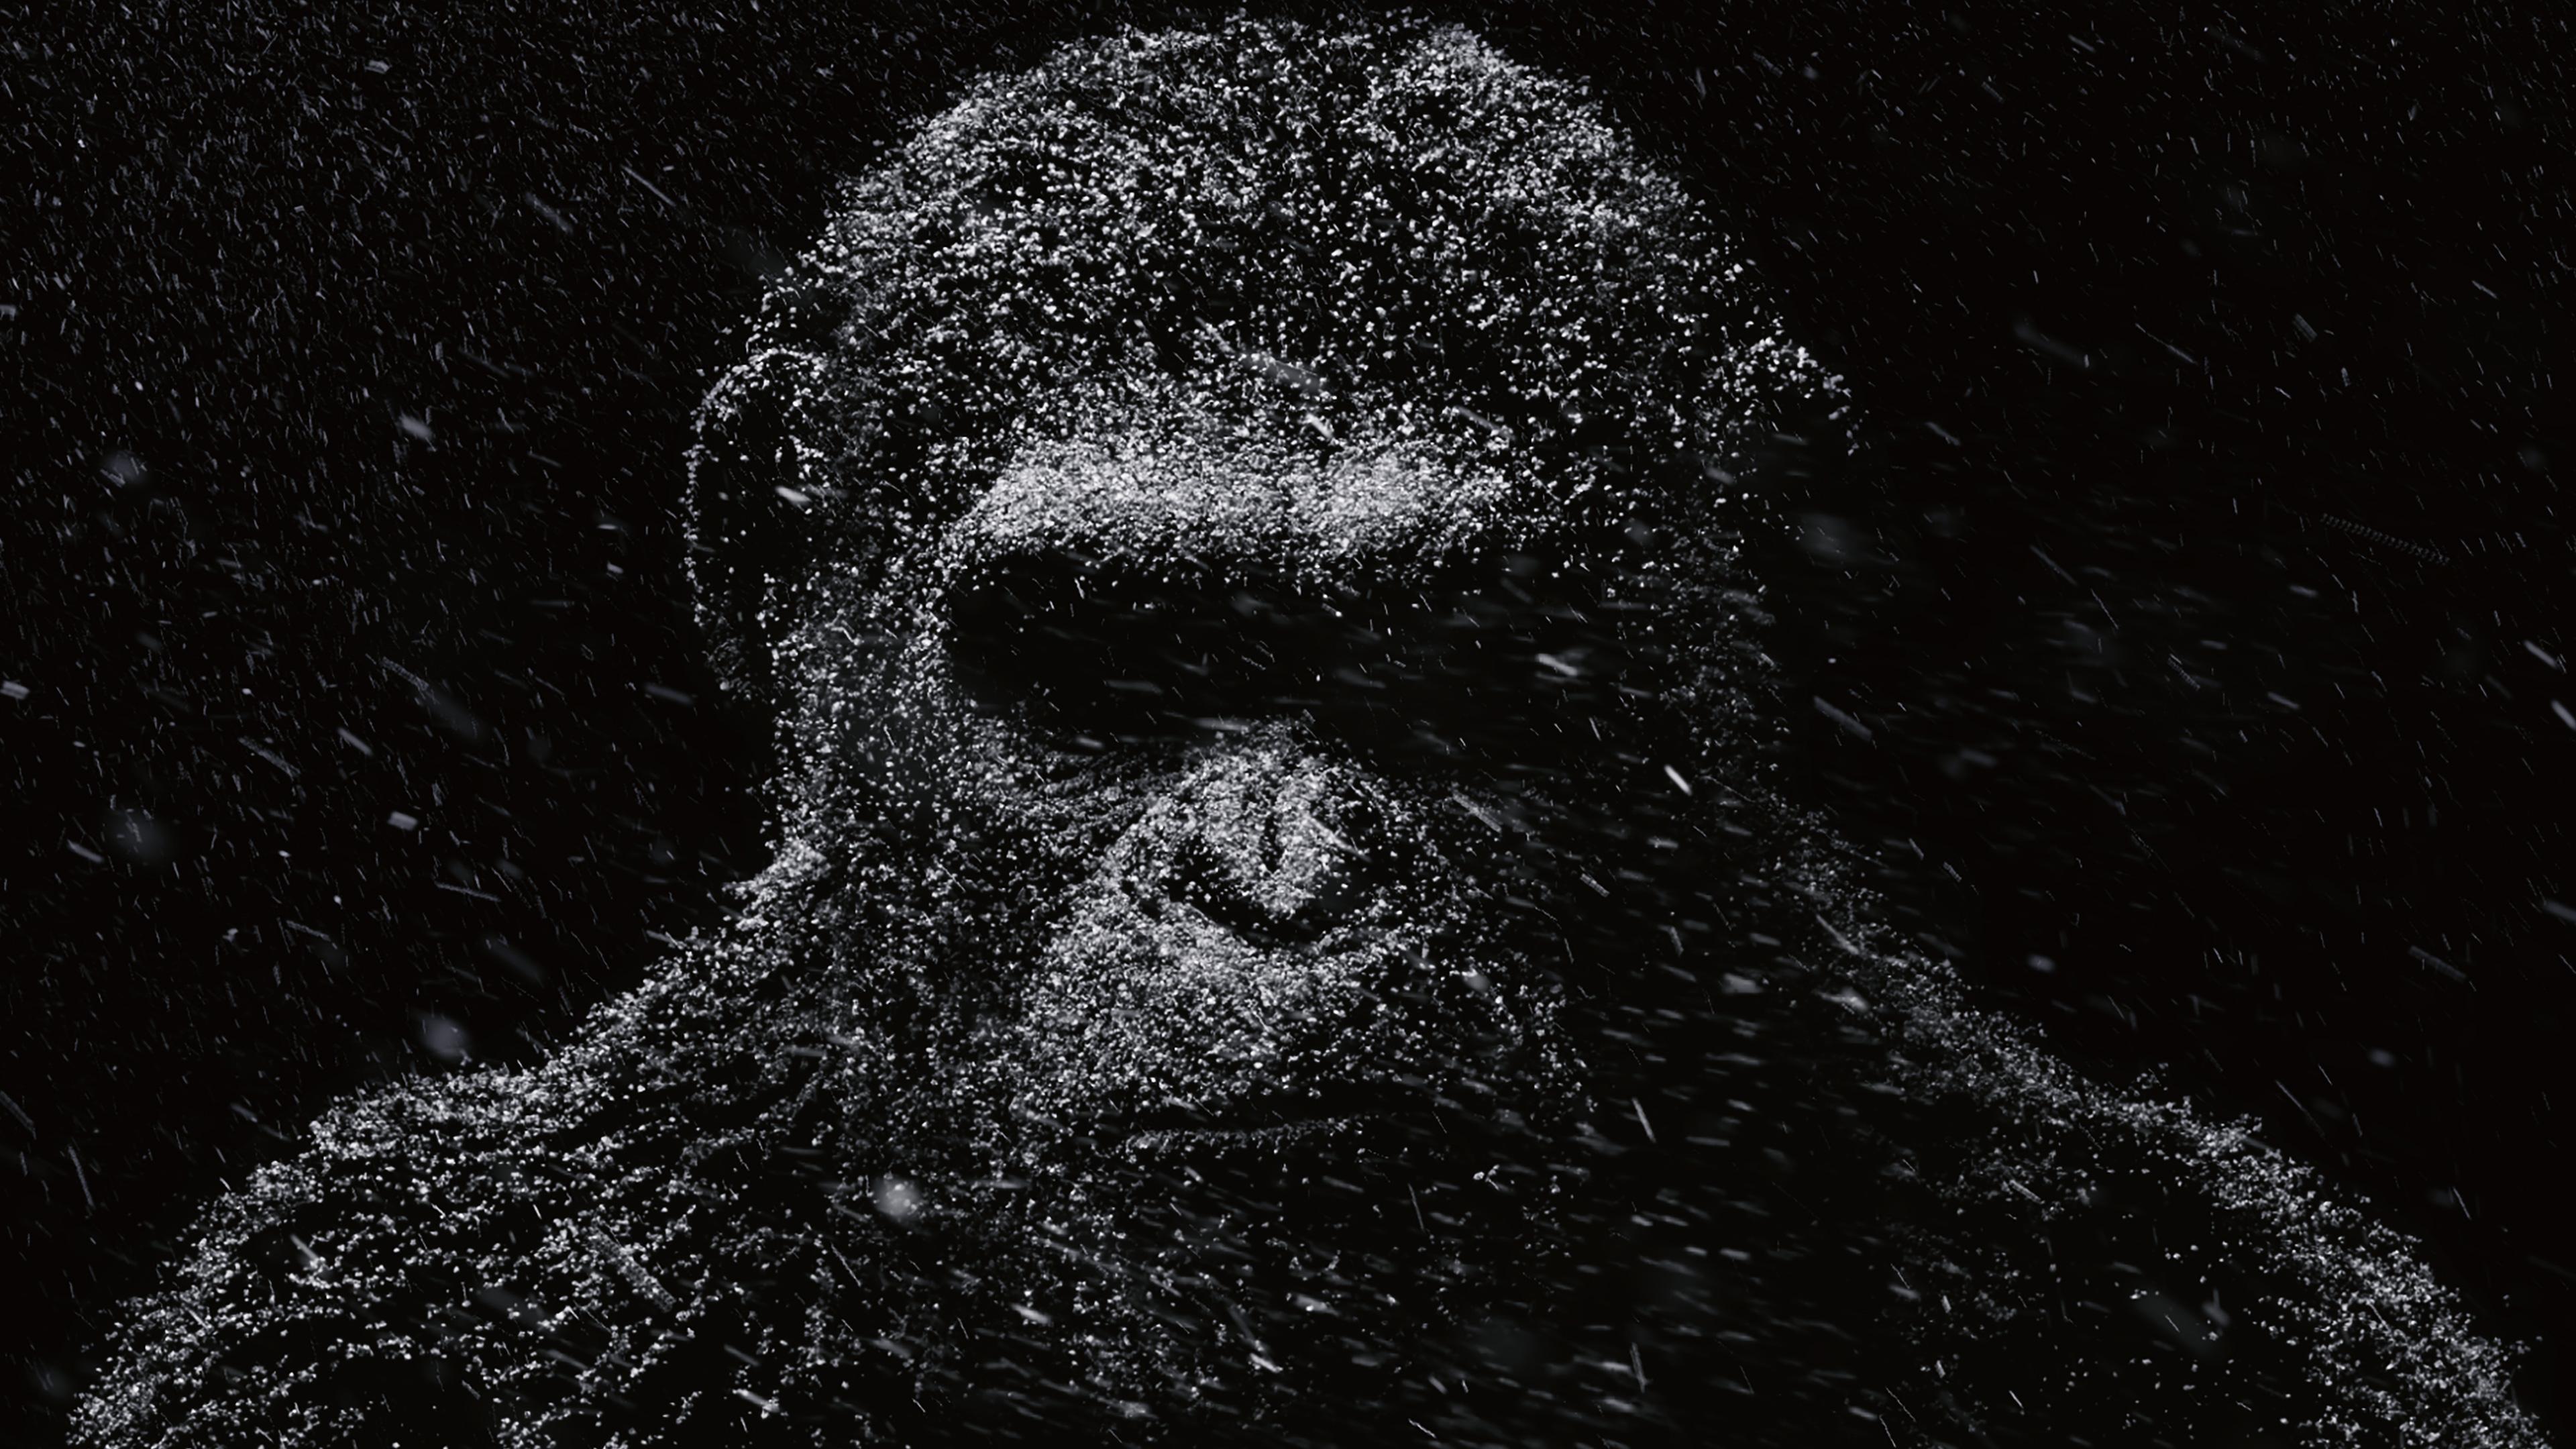 Цезарь война за планету обезьян. обои скачать